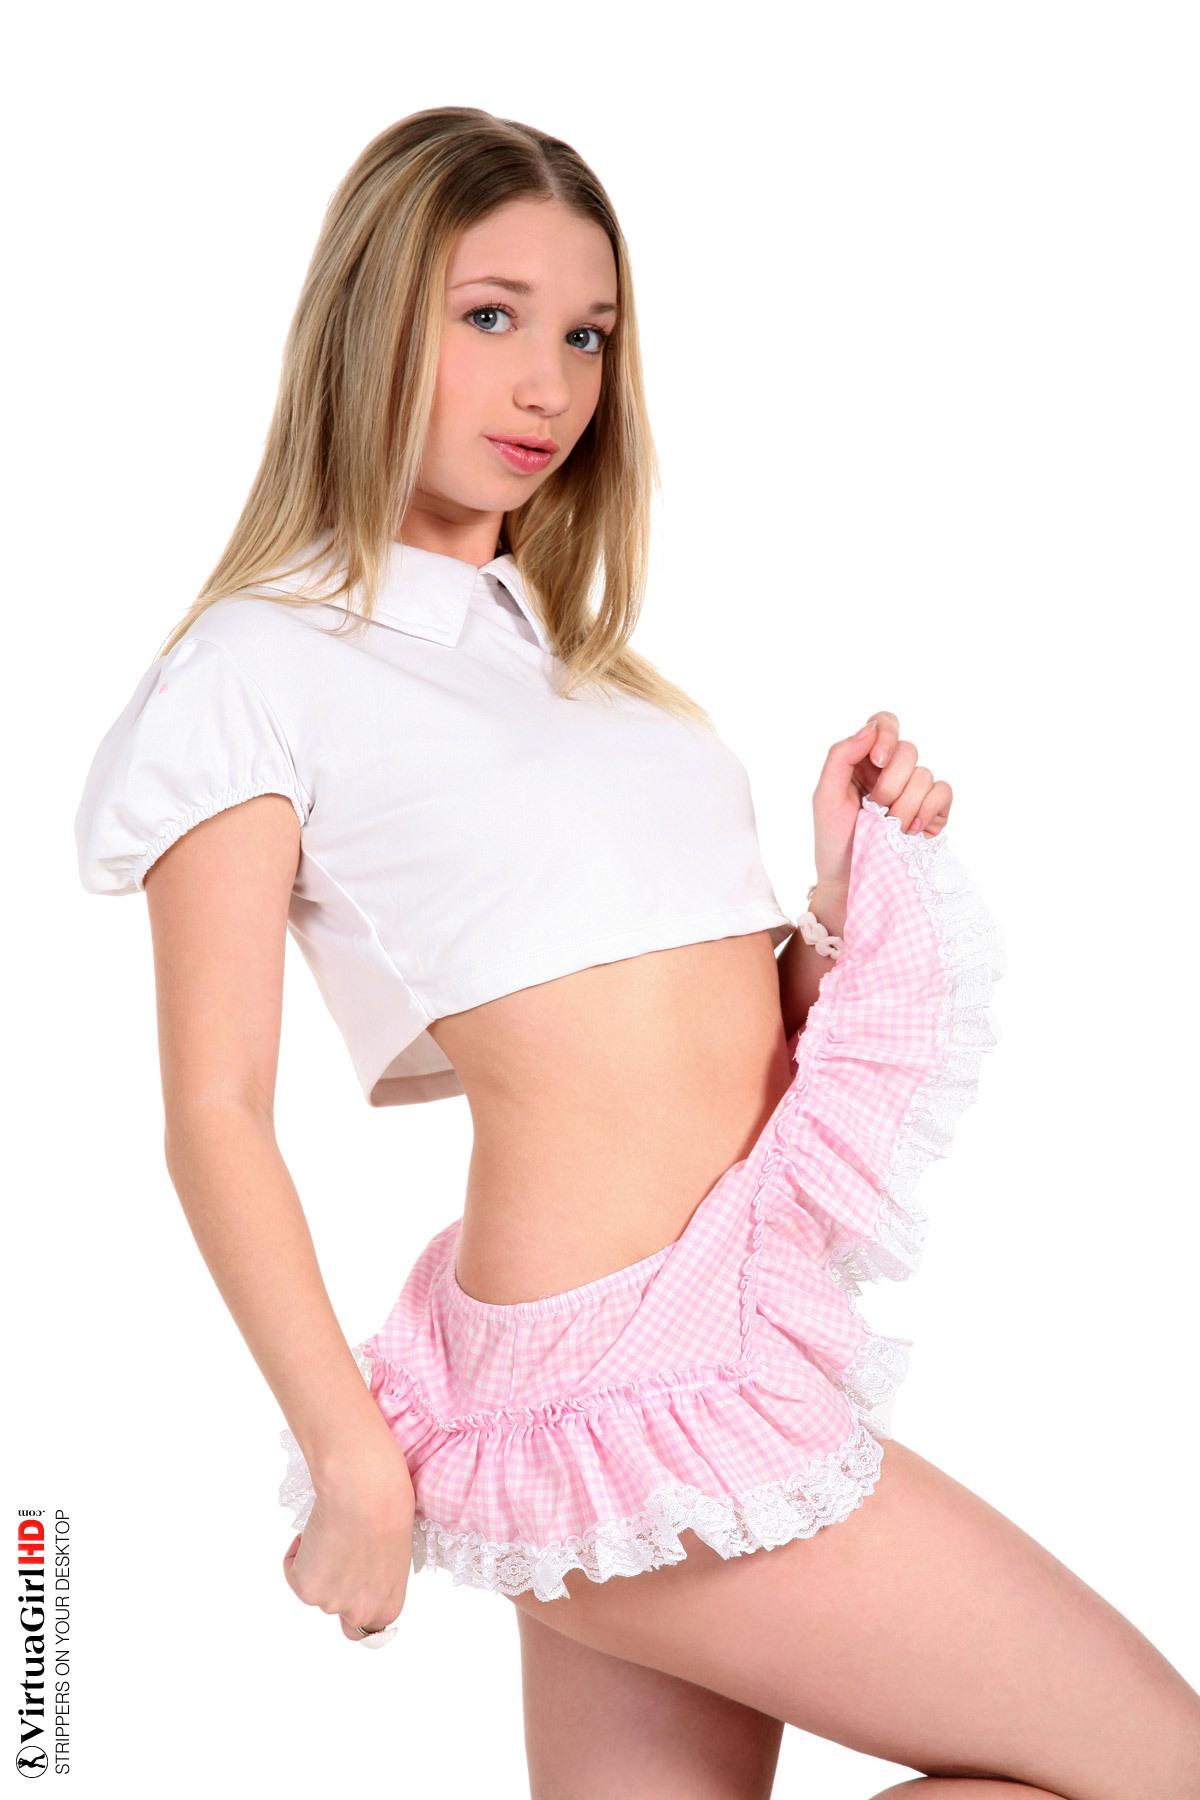 teenage girls in bikinis stripping